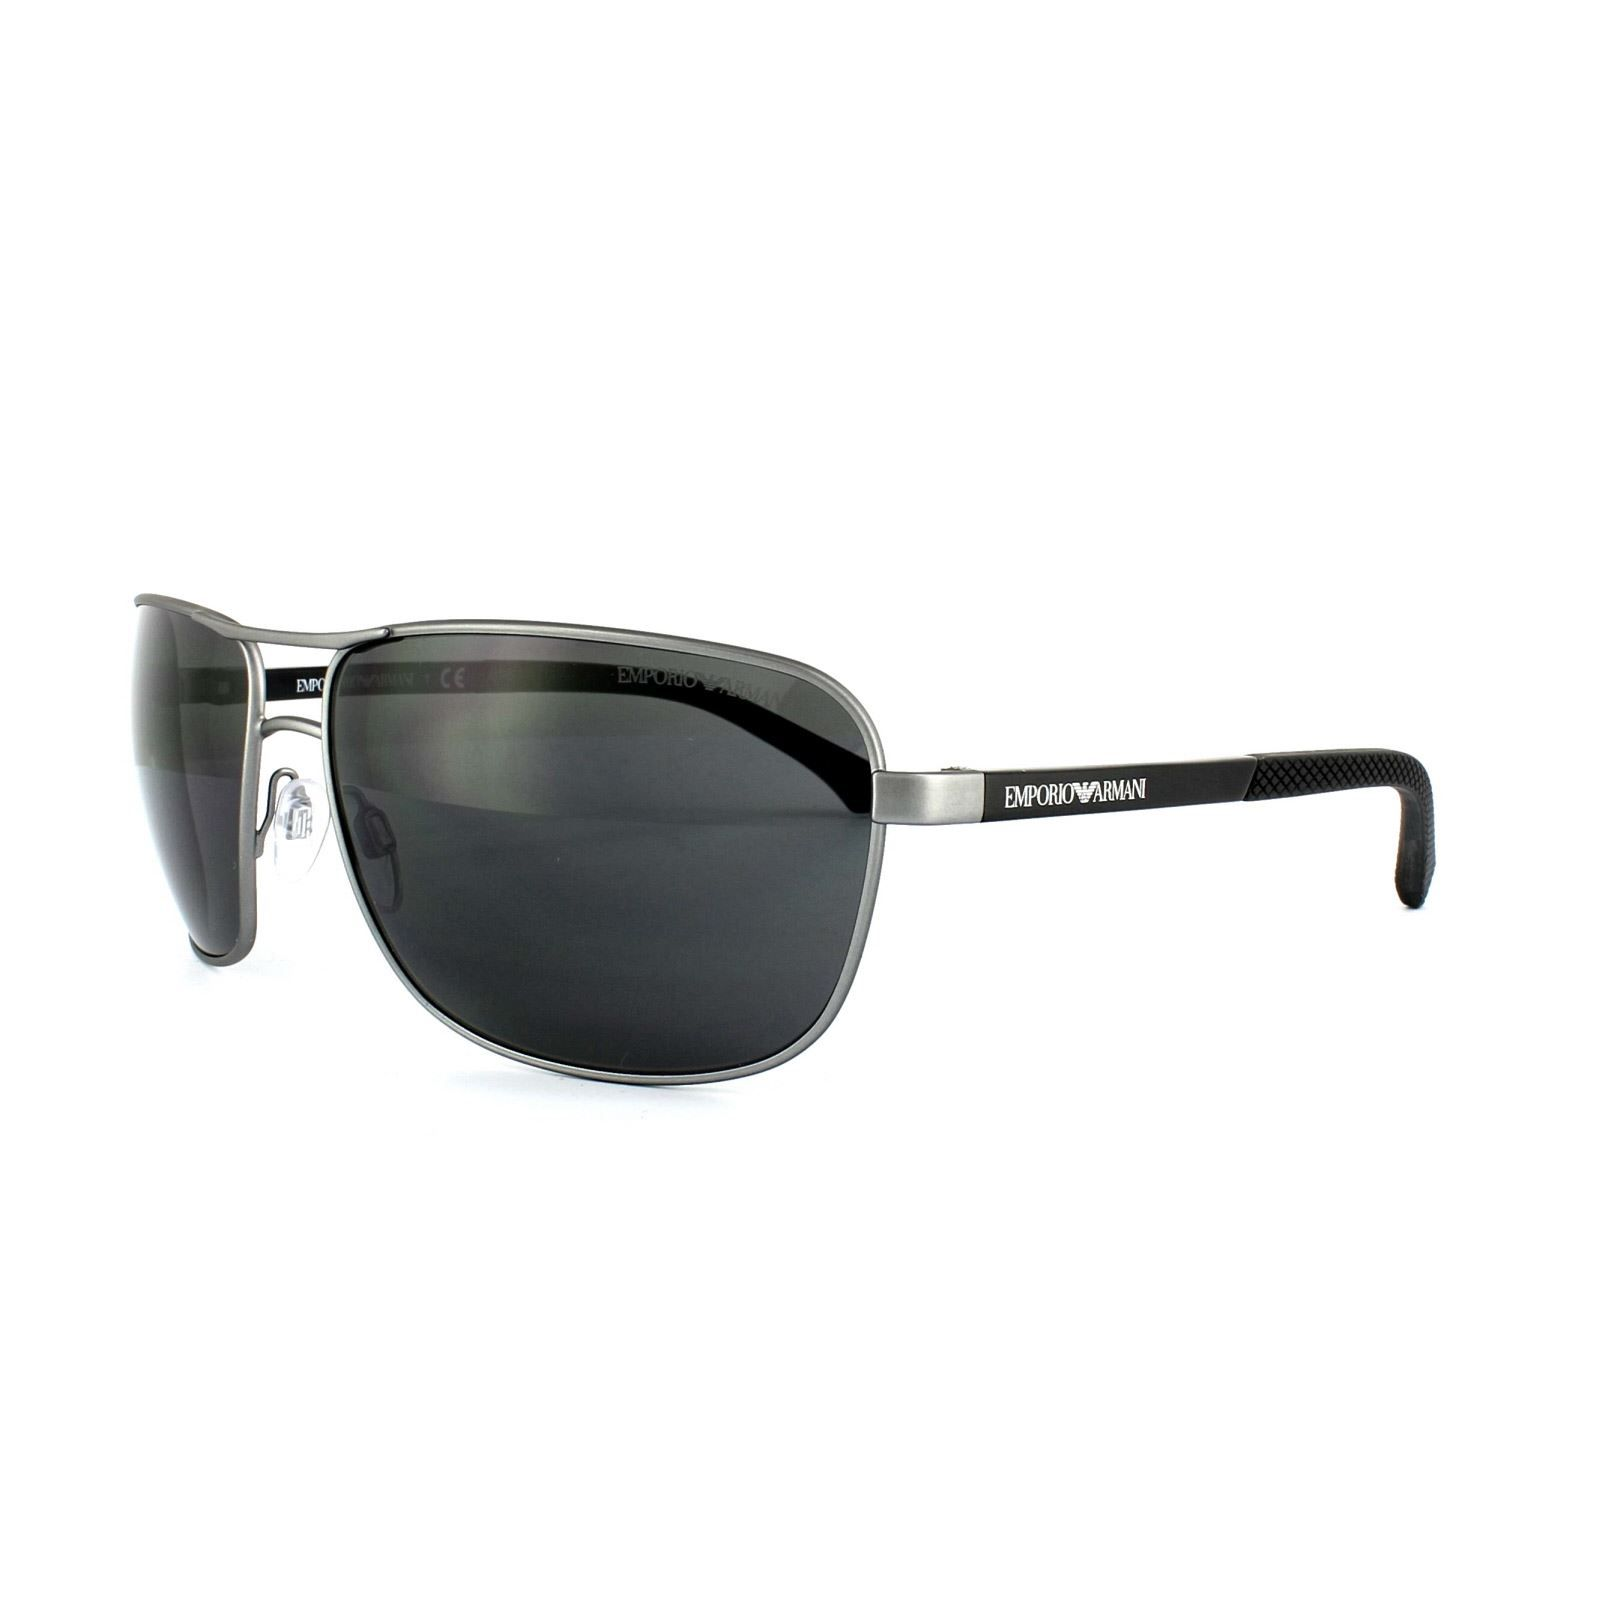 Emporio Armani Sunglasses 2033 3130/87 Ruthenium Rubber Grey